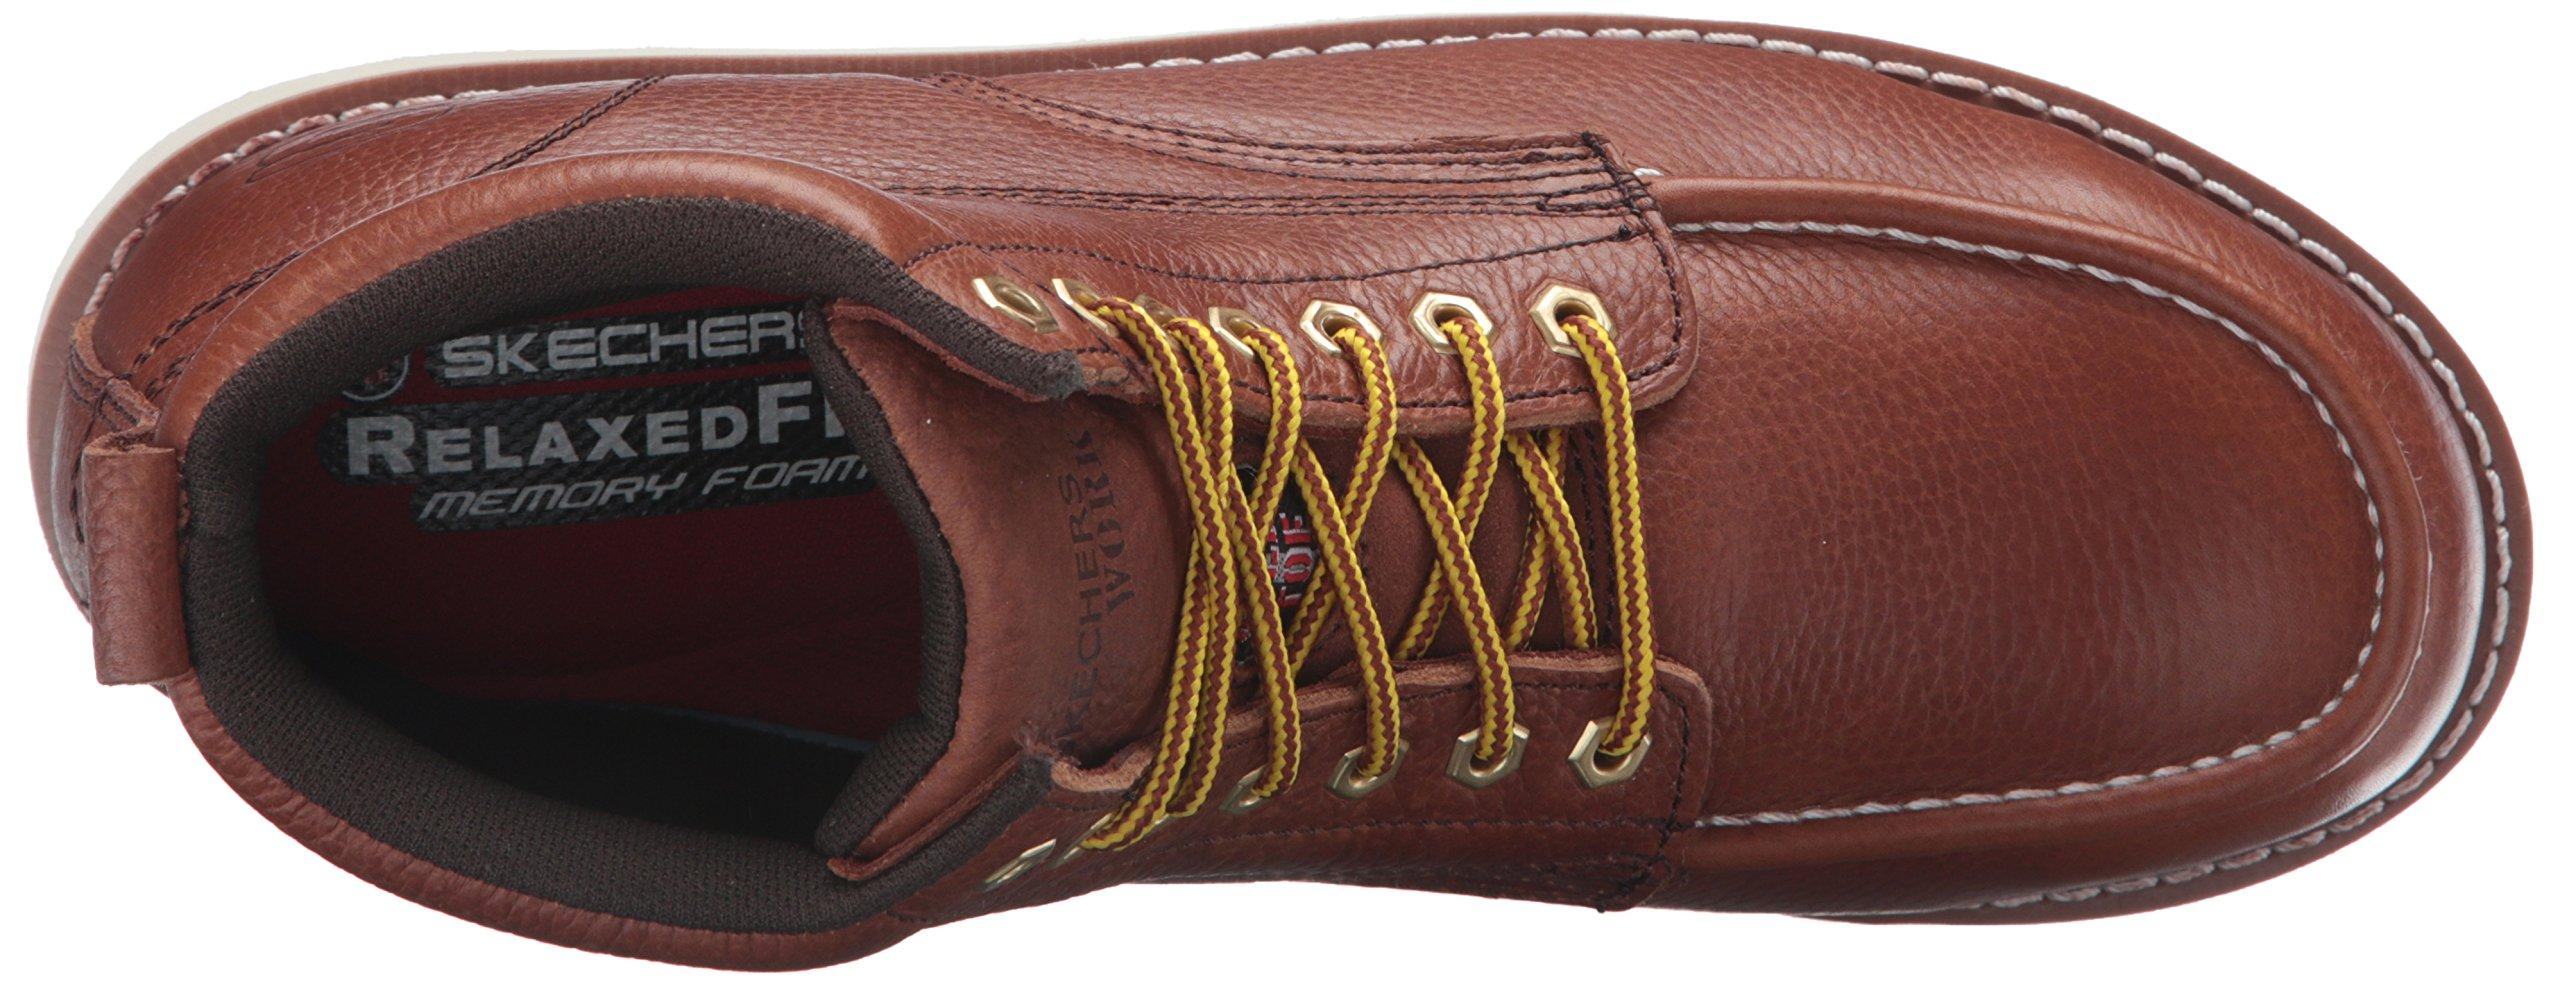 Skechers for Work Men's Pettus Grafford Work Boot,Red Brown,10.5 M US by Skechers (Image #8)